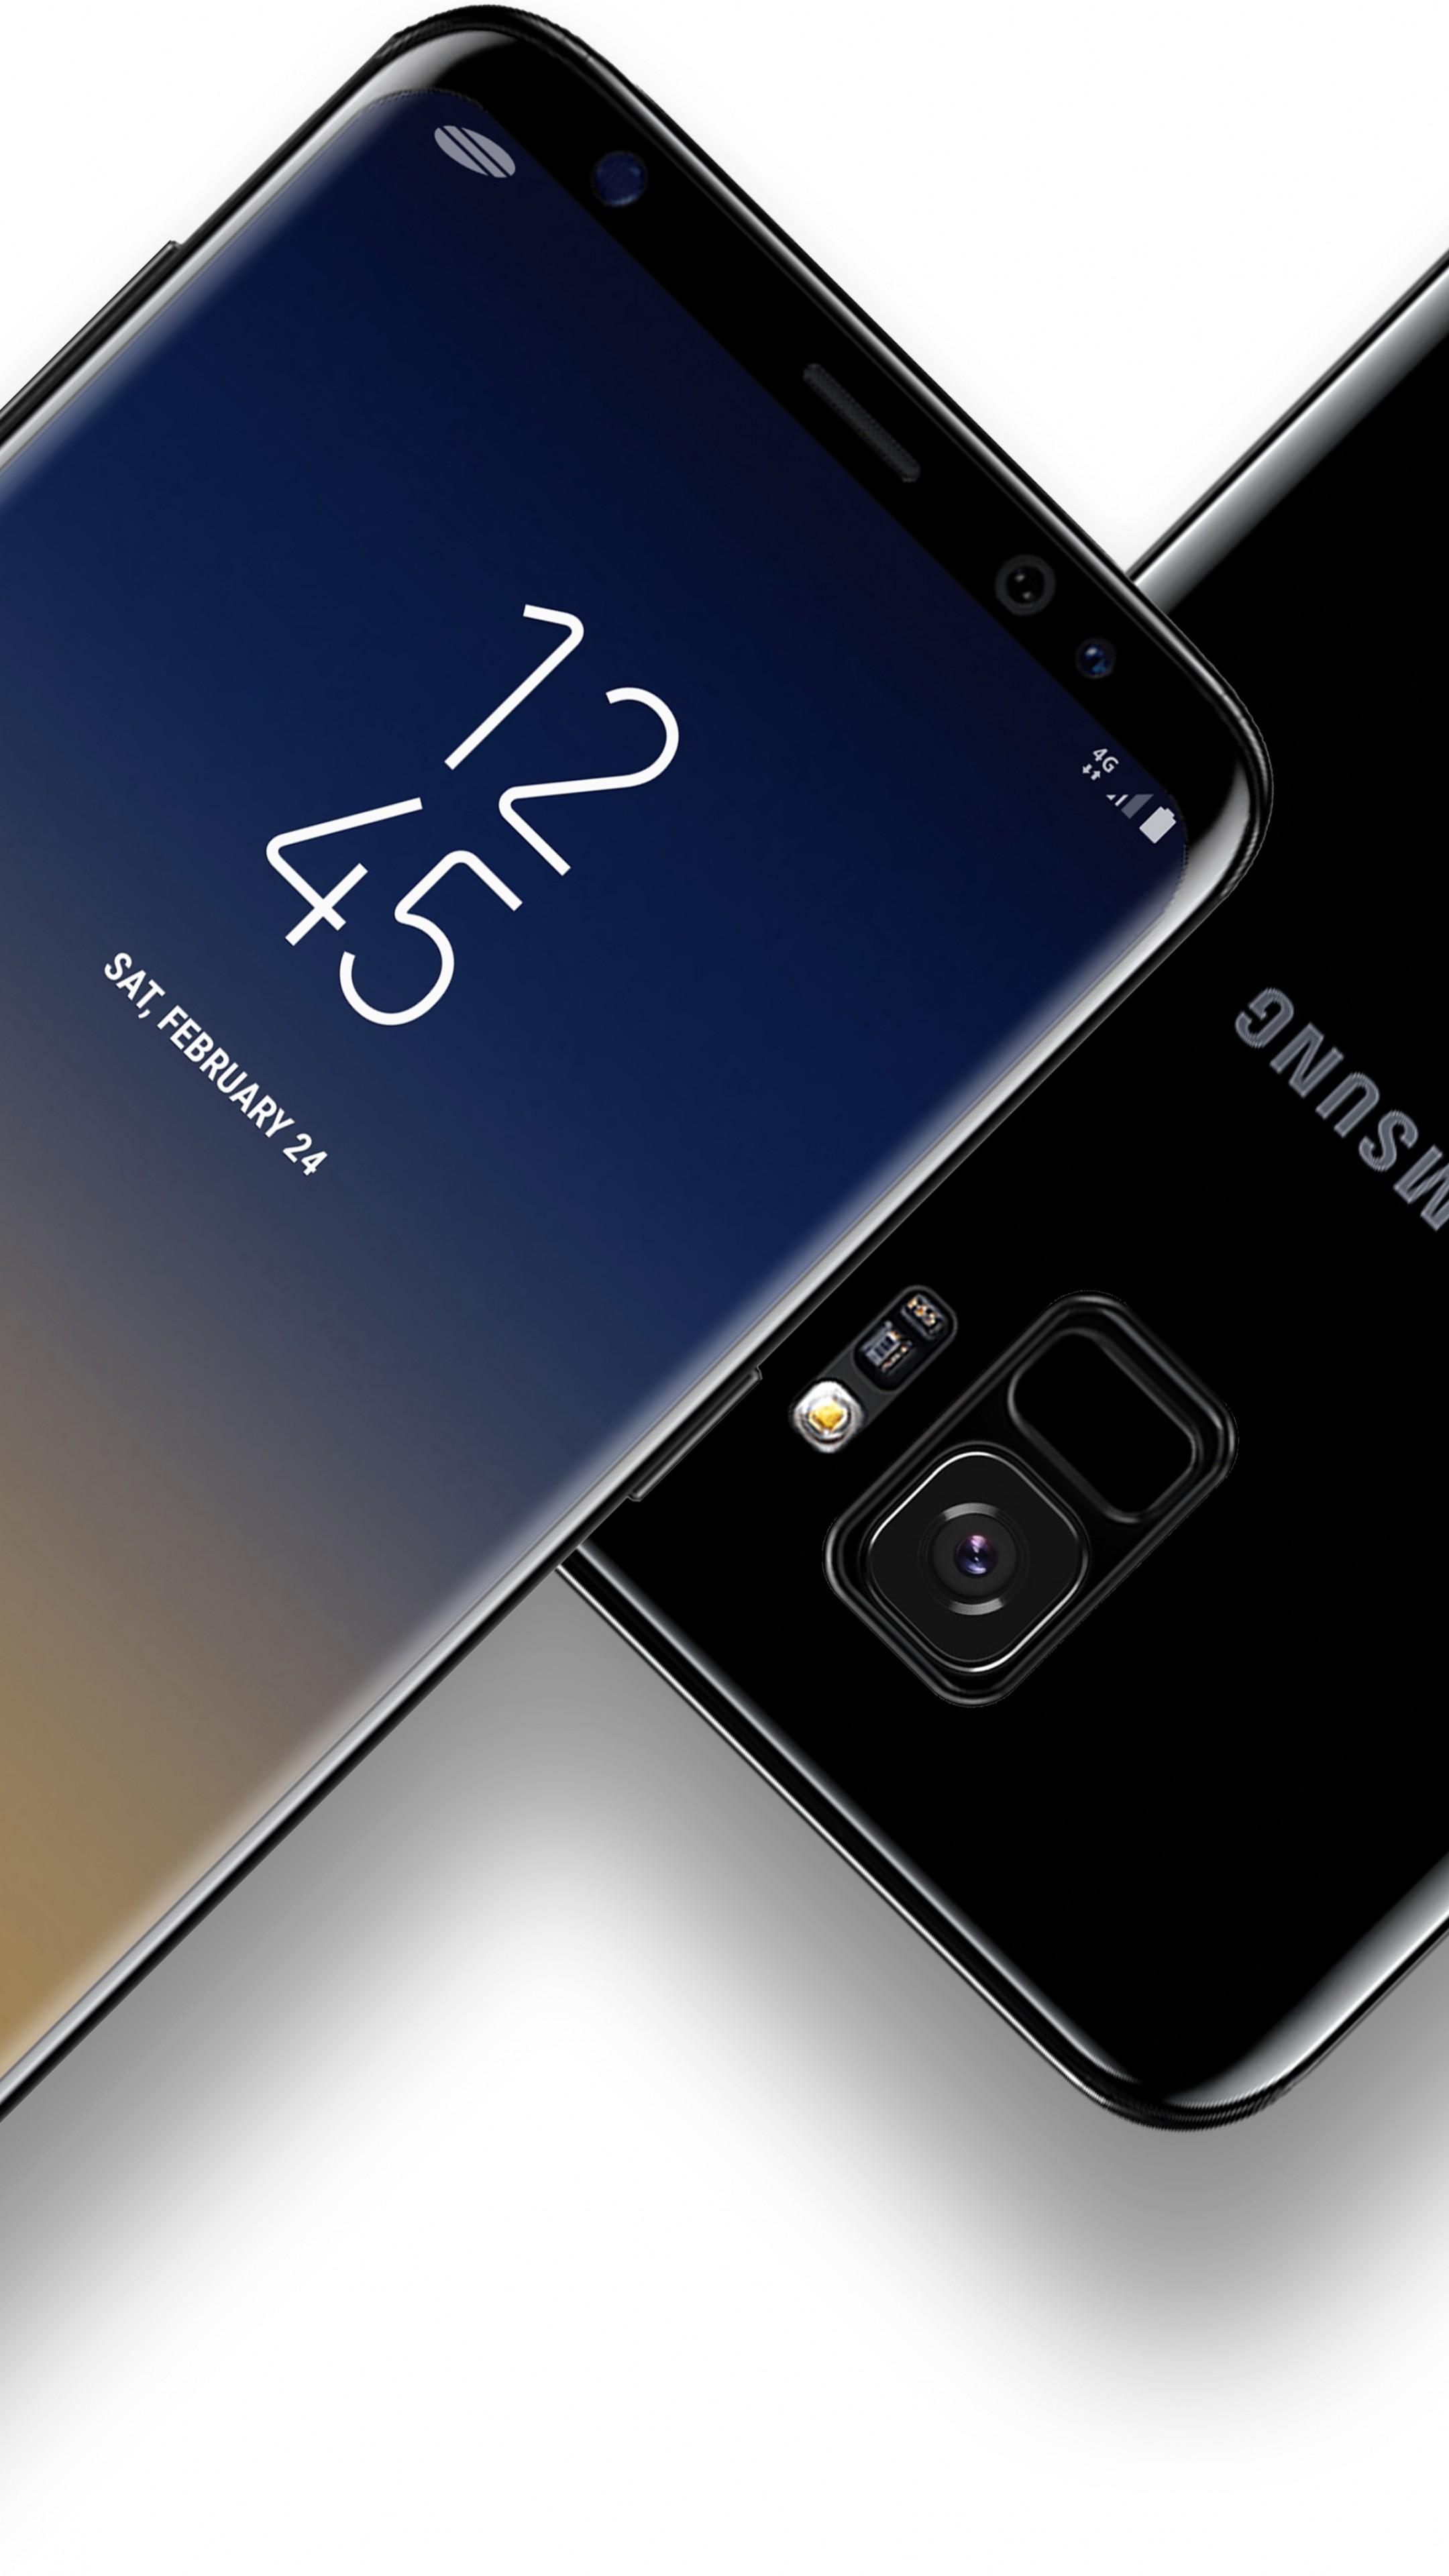 Wallpaper Samsung Galaxy S9 Smartphone 4k Hi Tech 17240